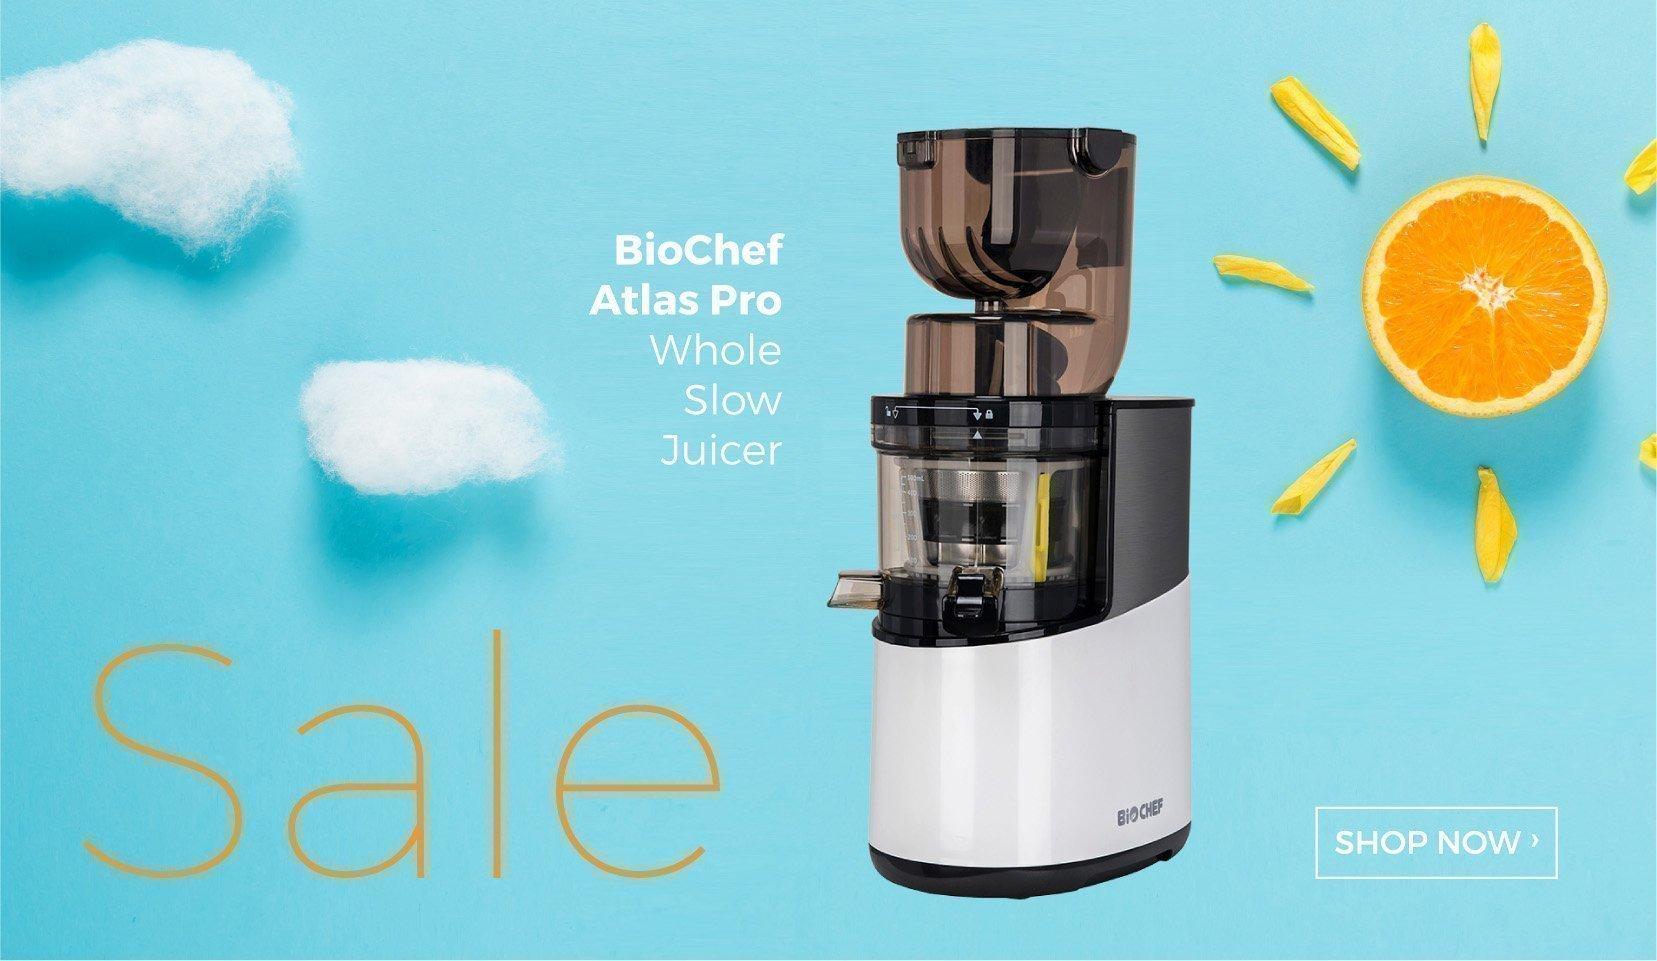 v4l-summer-sale-2019-EN-atlas-pro